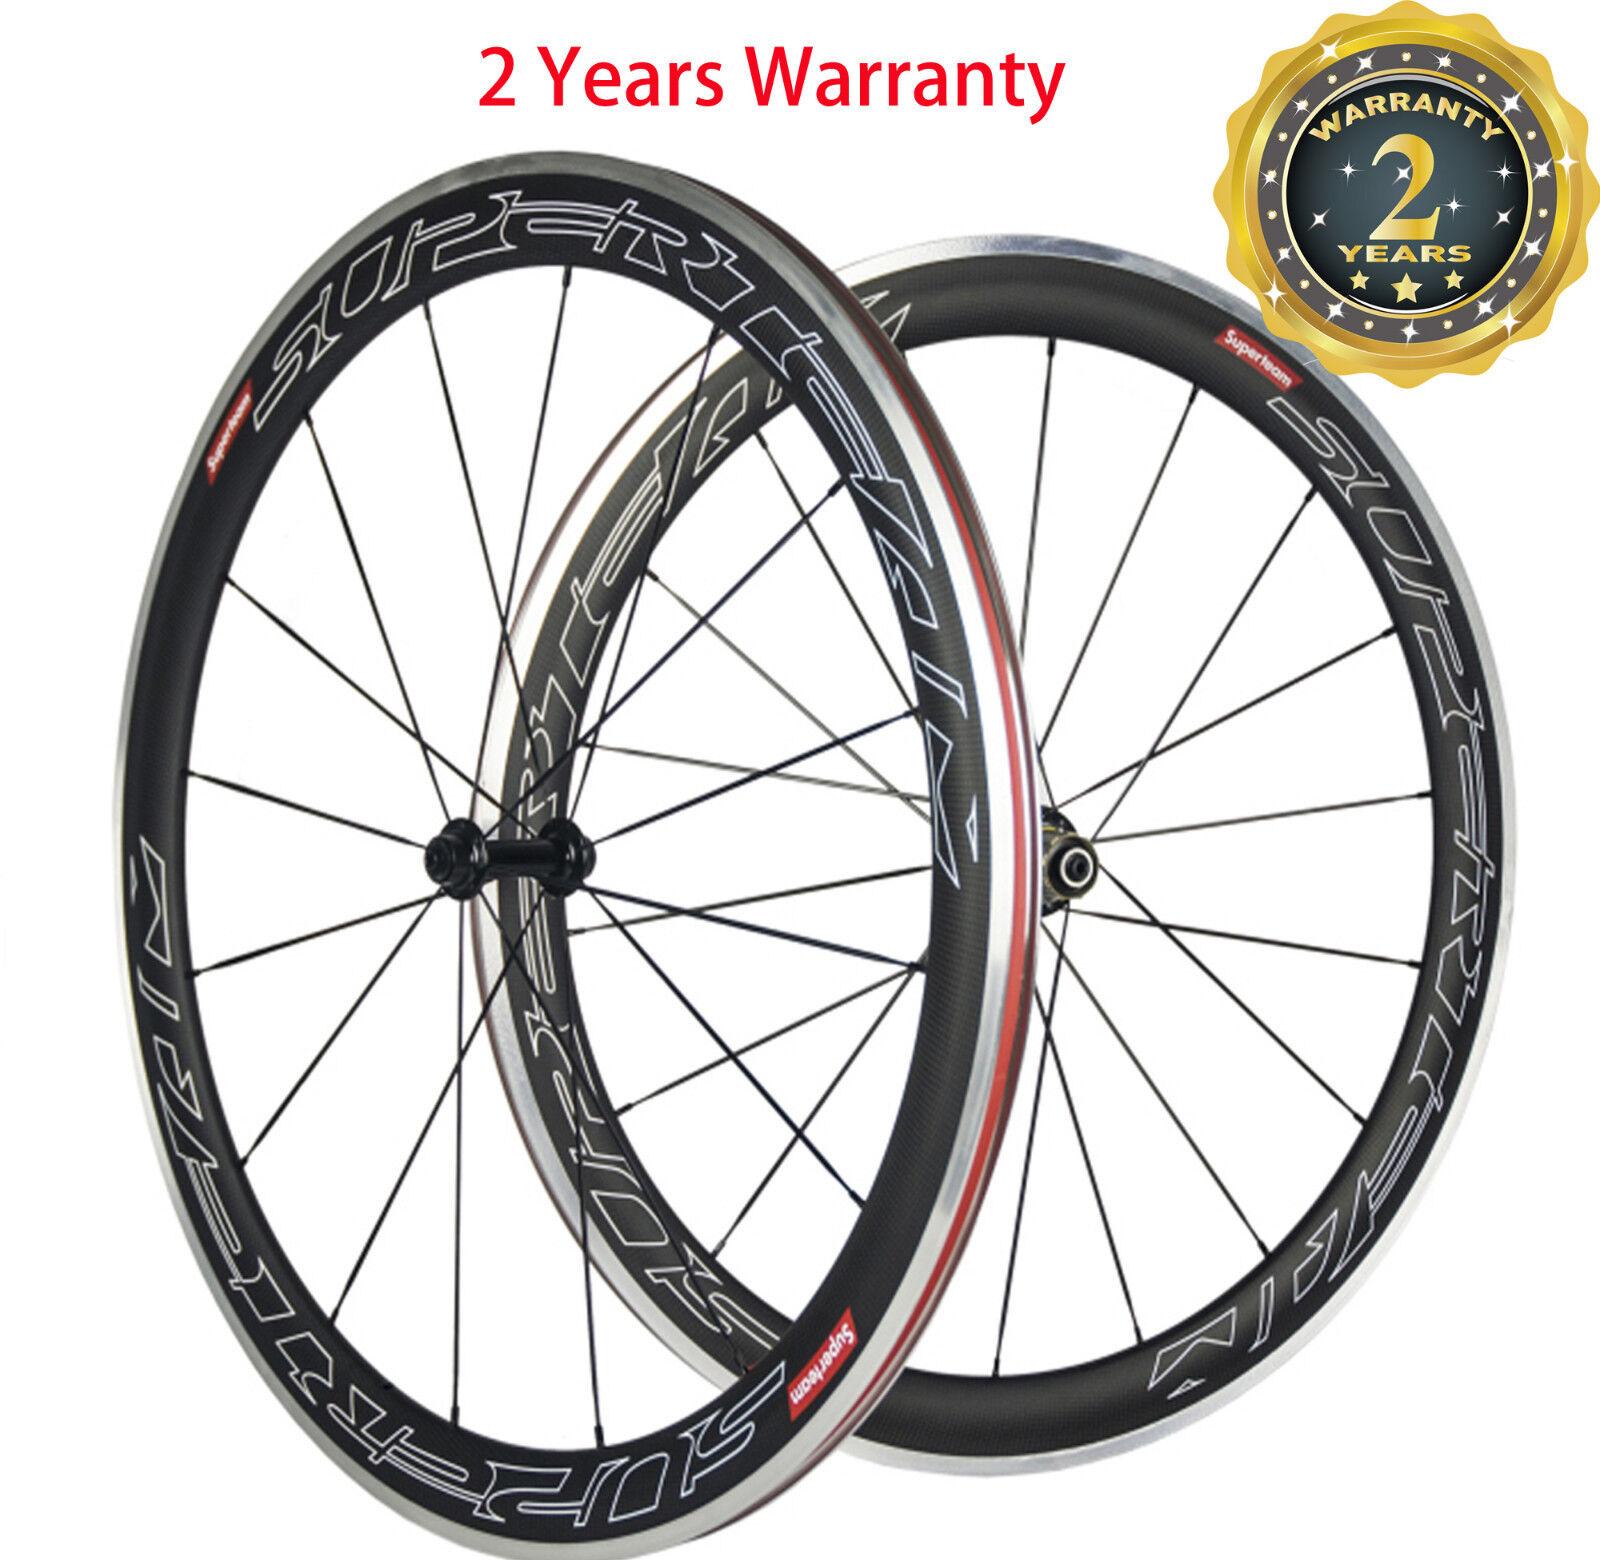 Superteam 50mm Carbon Bike Wheelset Carbon Bicycle Road Wheels 700C  Alloy Brake  save on clearance